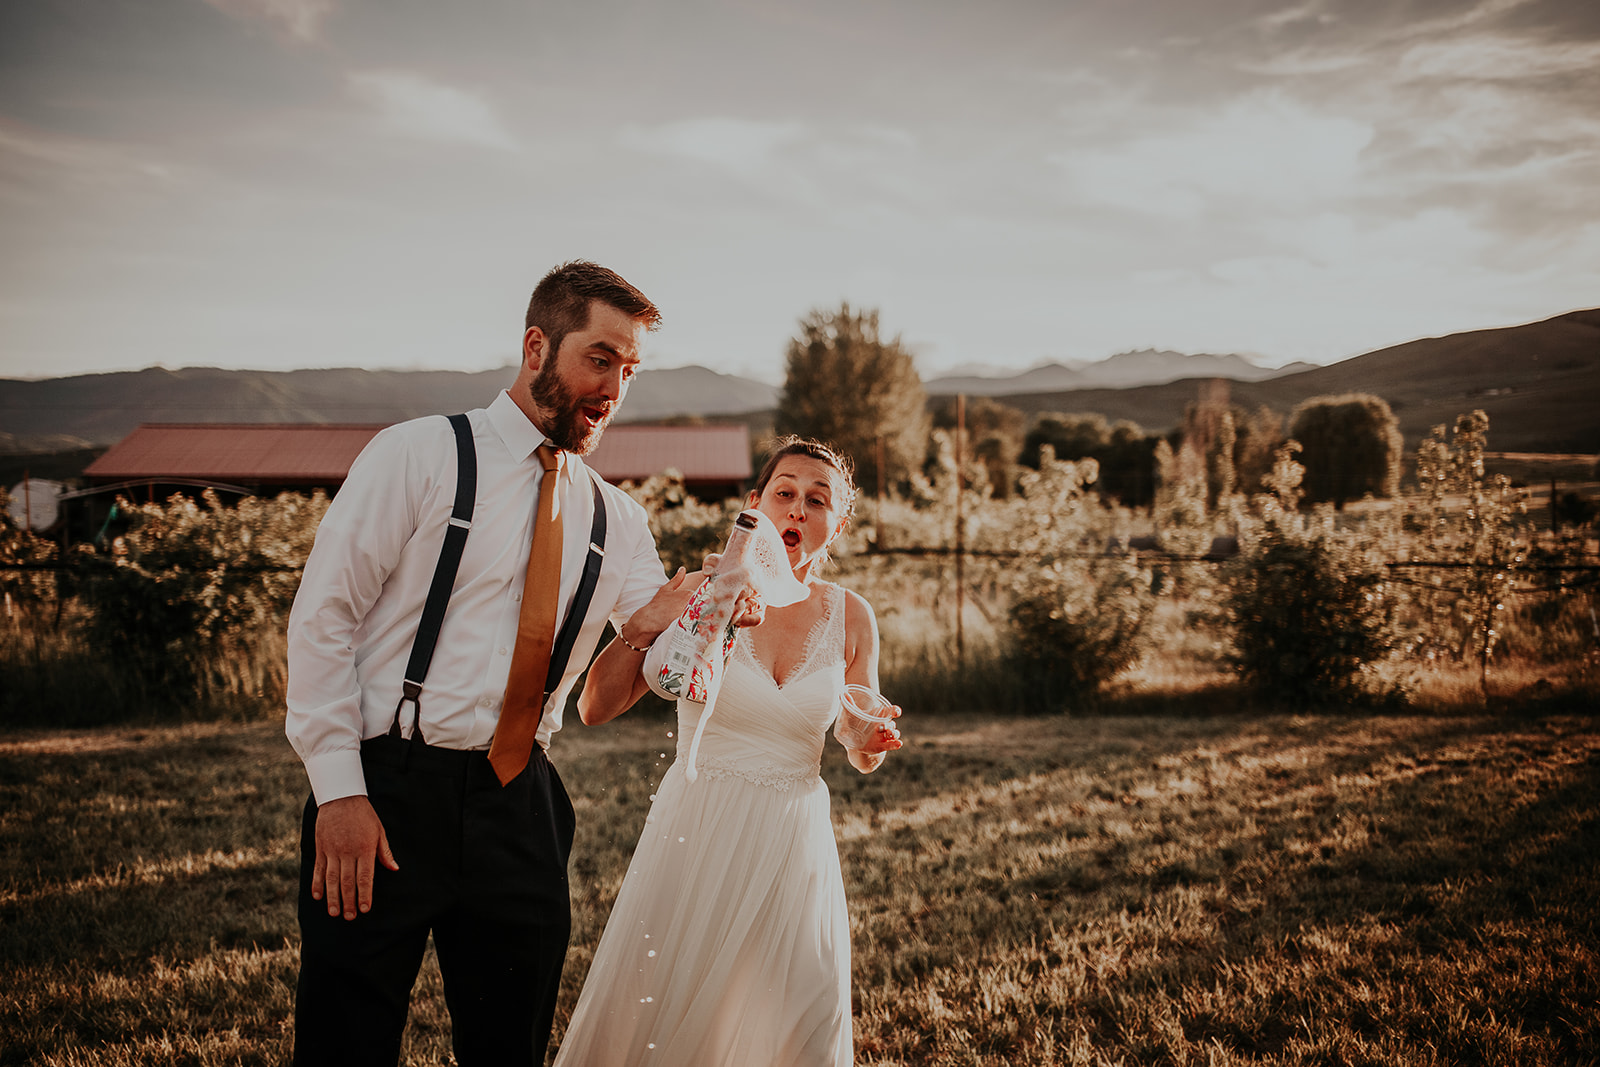 north-cascades-elopement-wedding-winthrop-wedding-photographer-megan-gallagher-photography (34).jpg